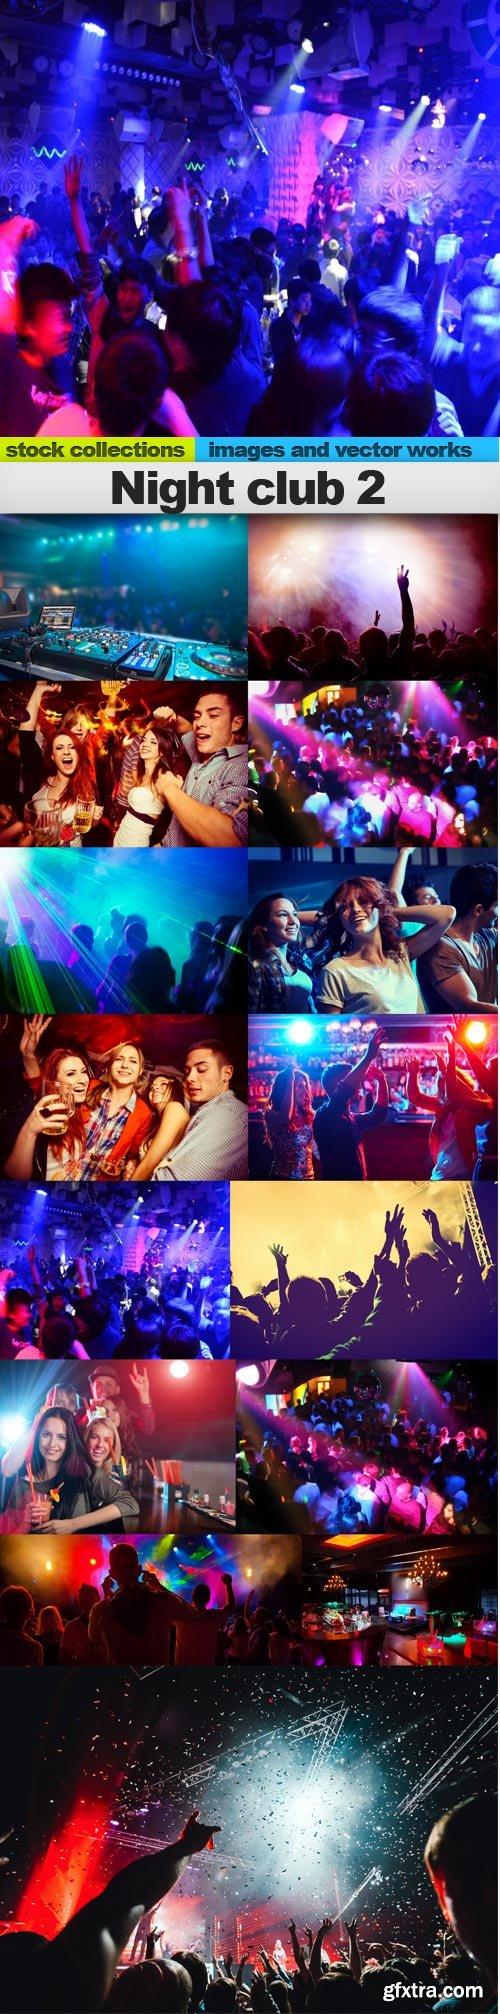 Night club 2, 15 x UHQ JPEG